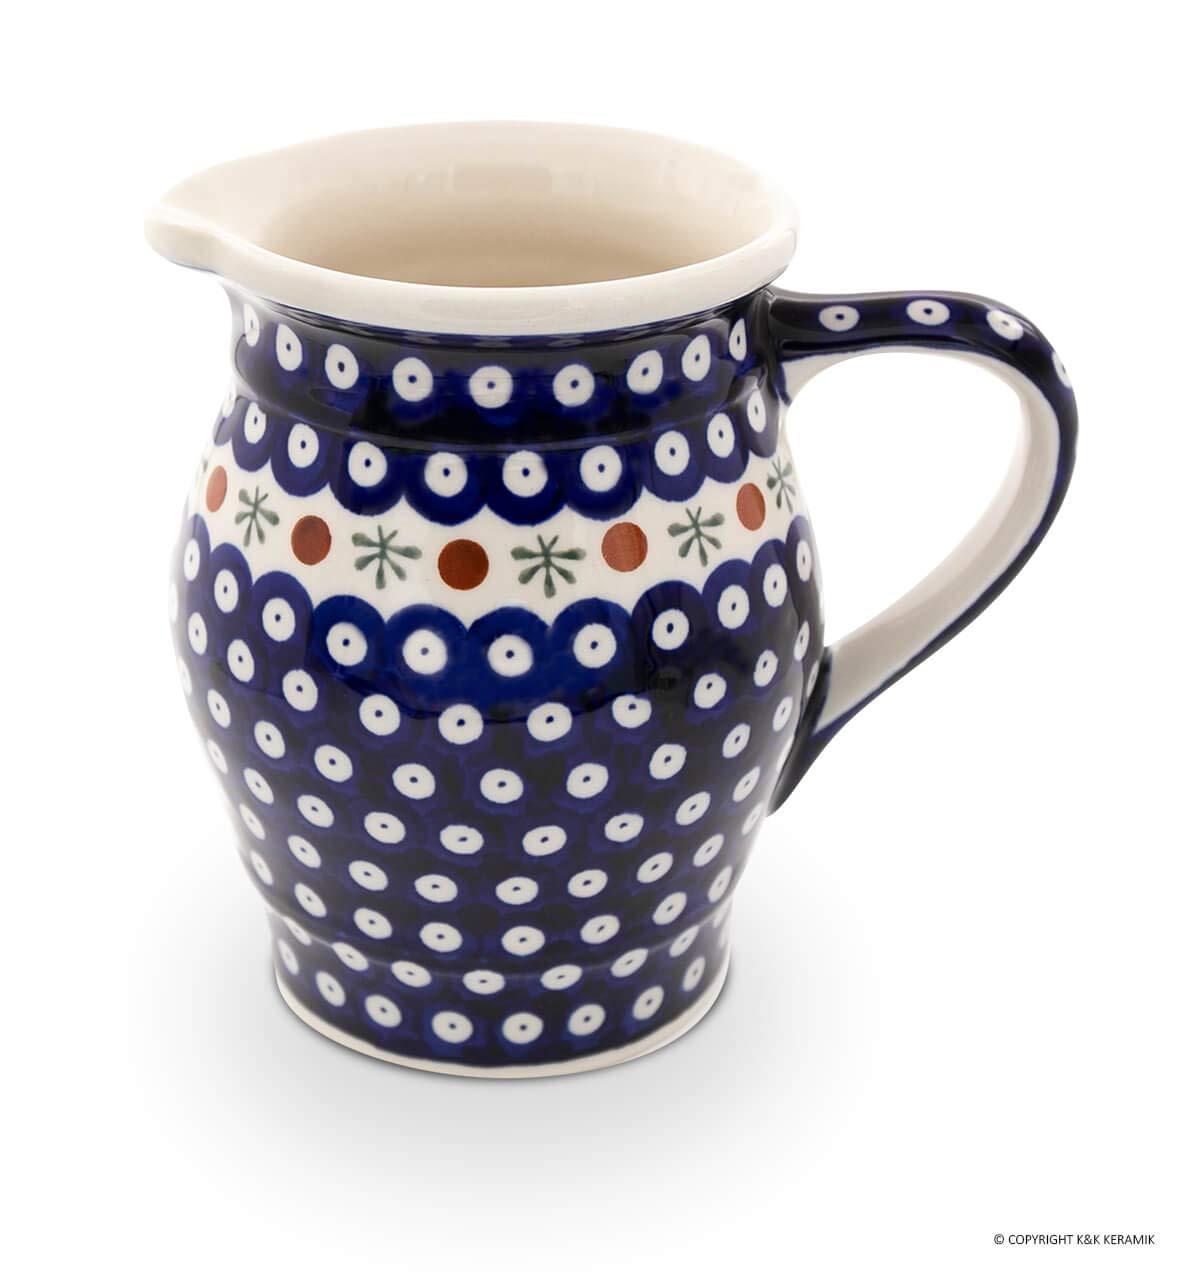 Hand-Decorated Polish Pottery Jug/Ice Tea Jug/Milk Jug 1.4Litre ø18.3cm Height 17.5cm–decor 41